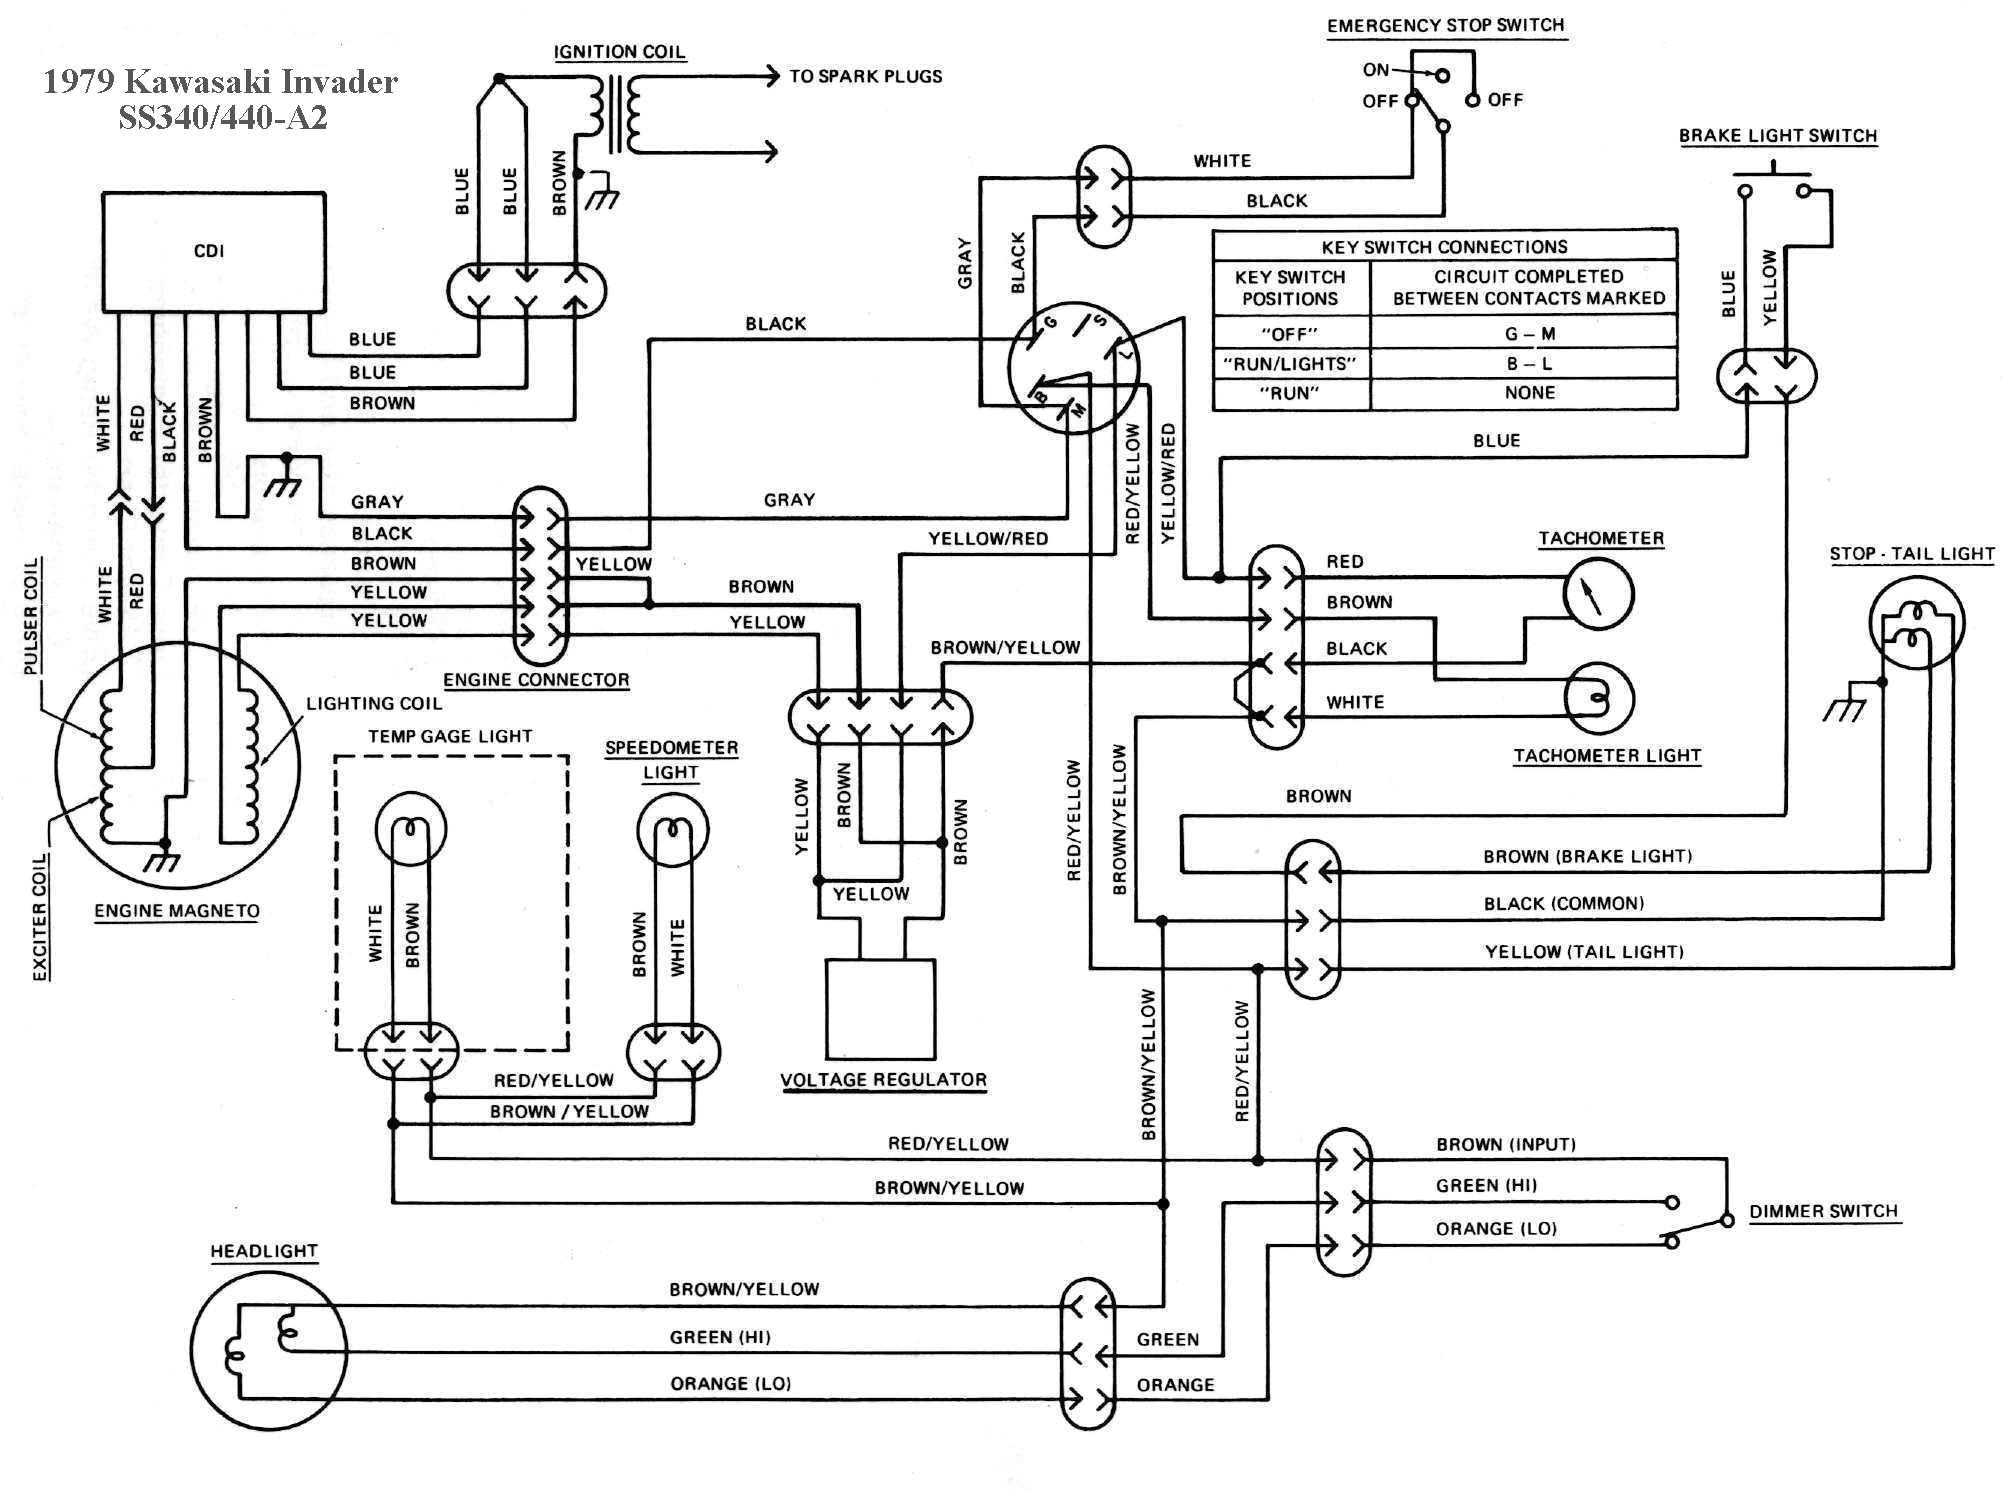 kawasaki kdx 175 wiring diagram general wiring diagram data jpg